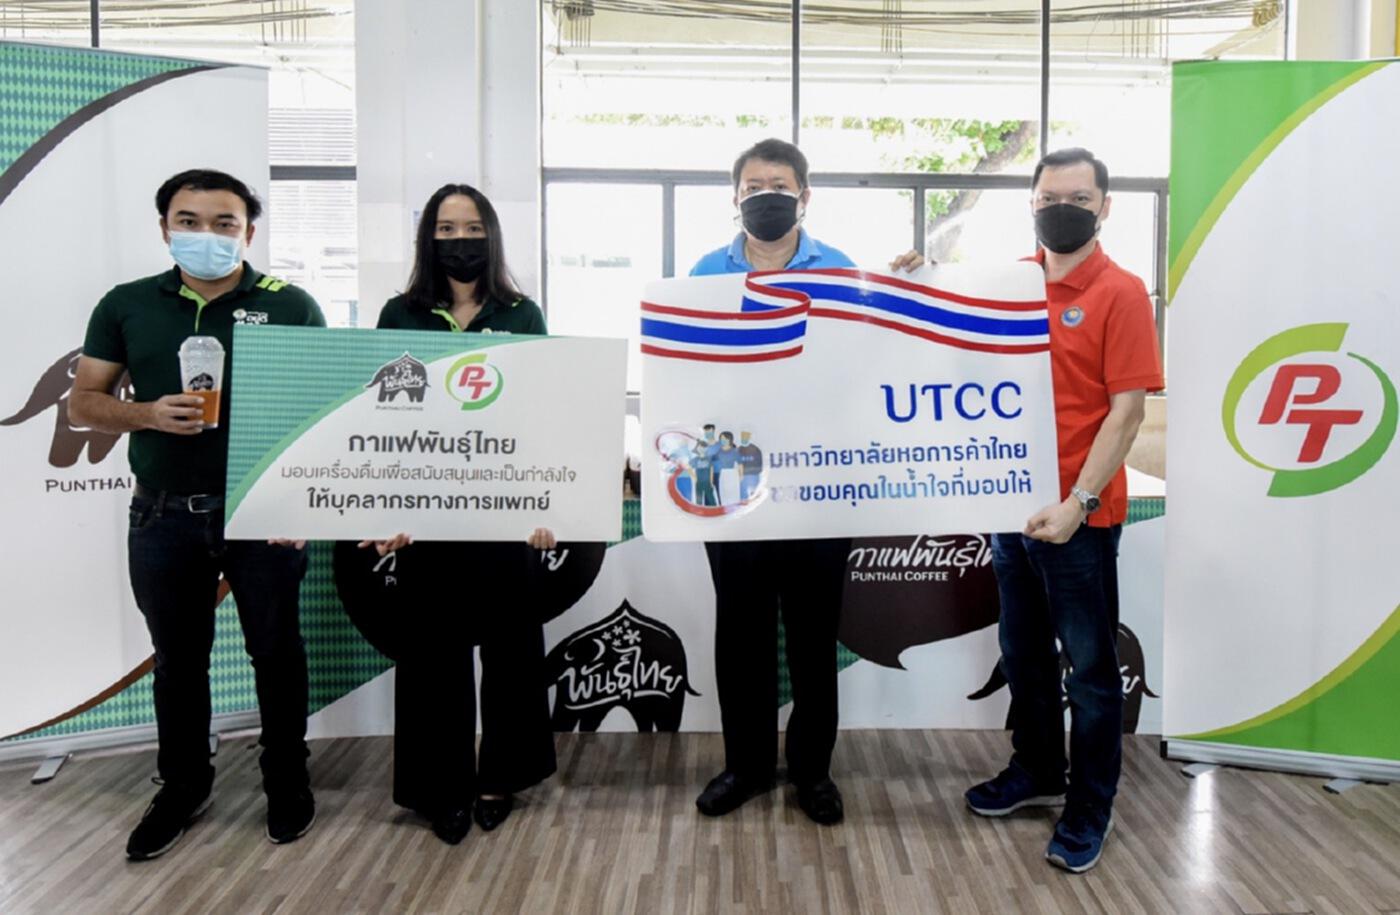 PTG มอบเครื่องดื่ม สนับหนุนศูนย์ฉีดวัคซีน COVID-19 ม.หอการค้าไทย